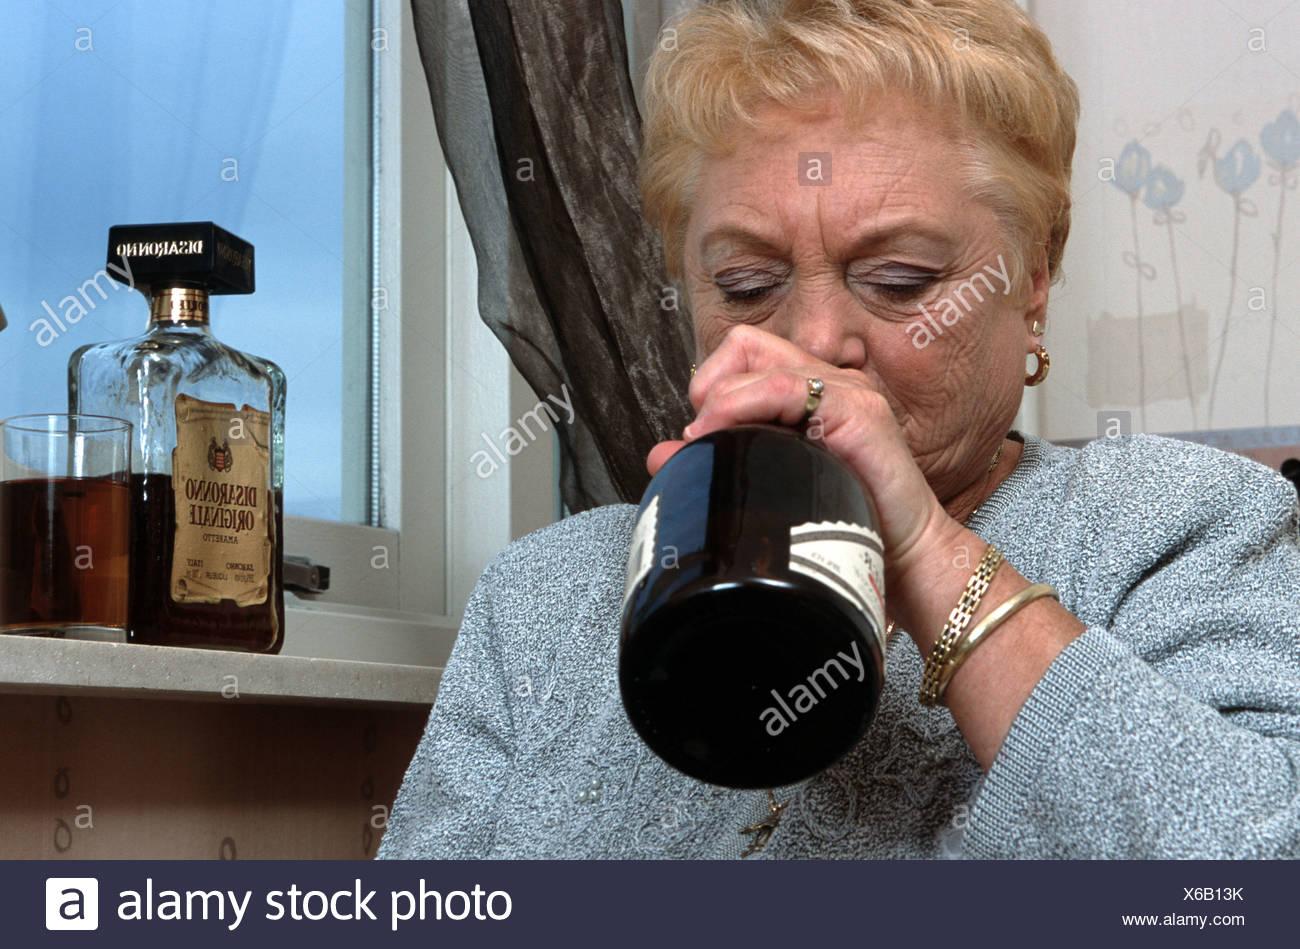 Frau Betrunken